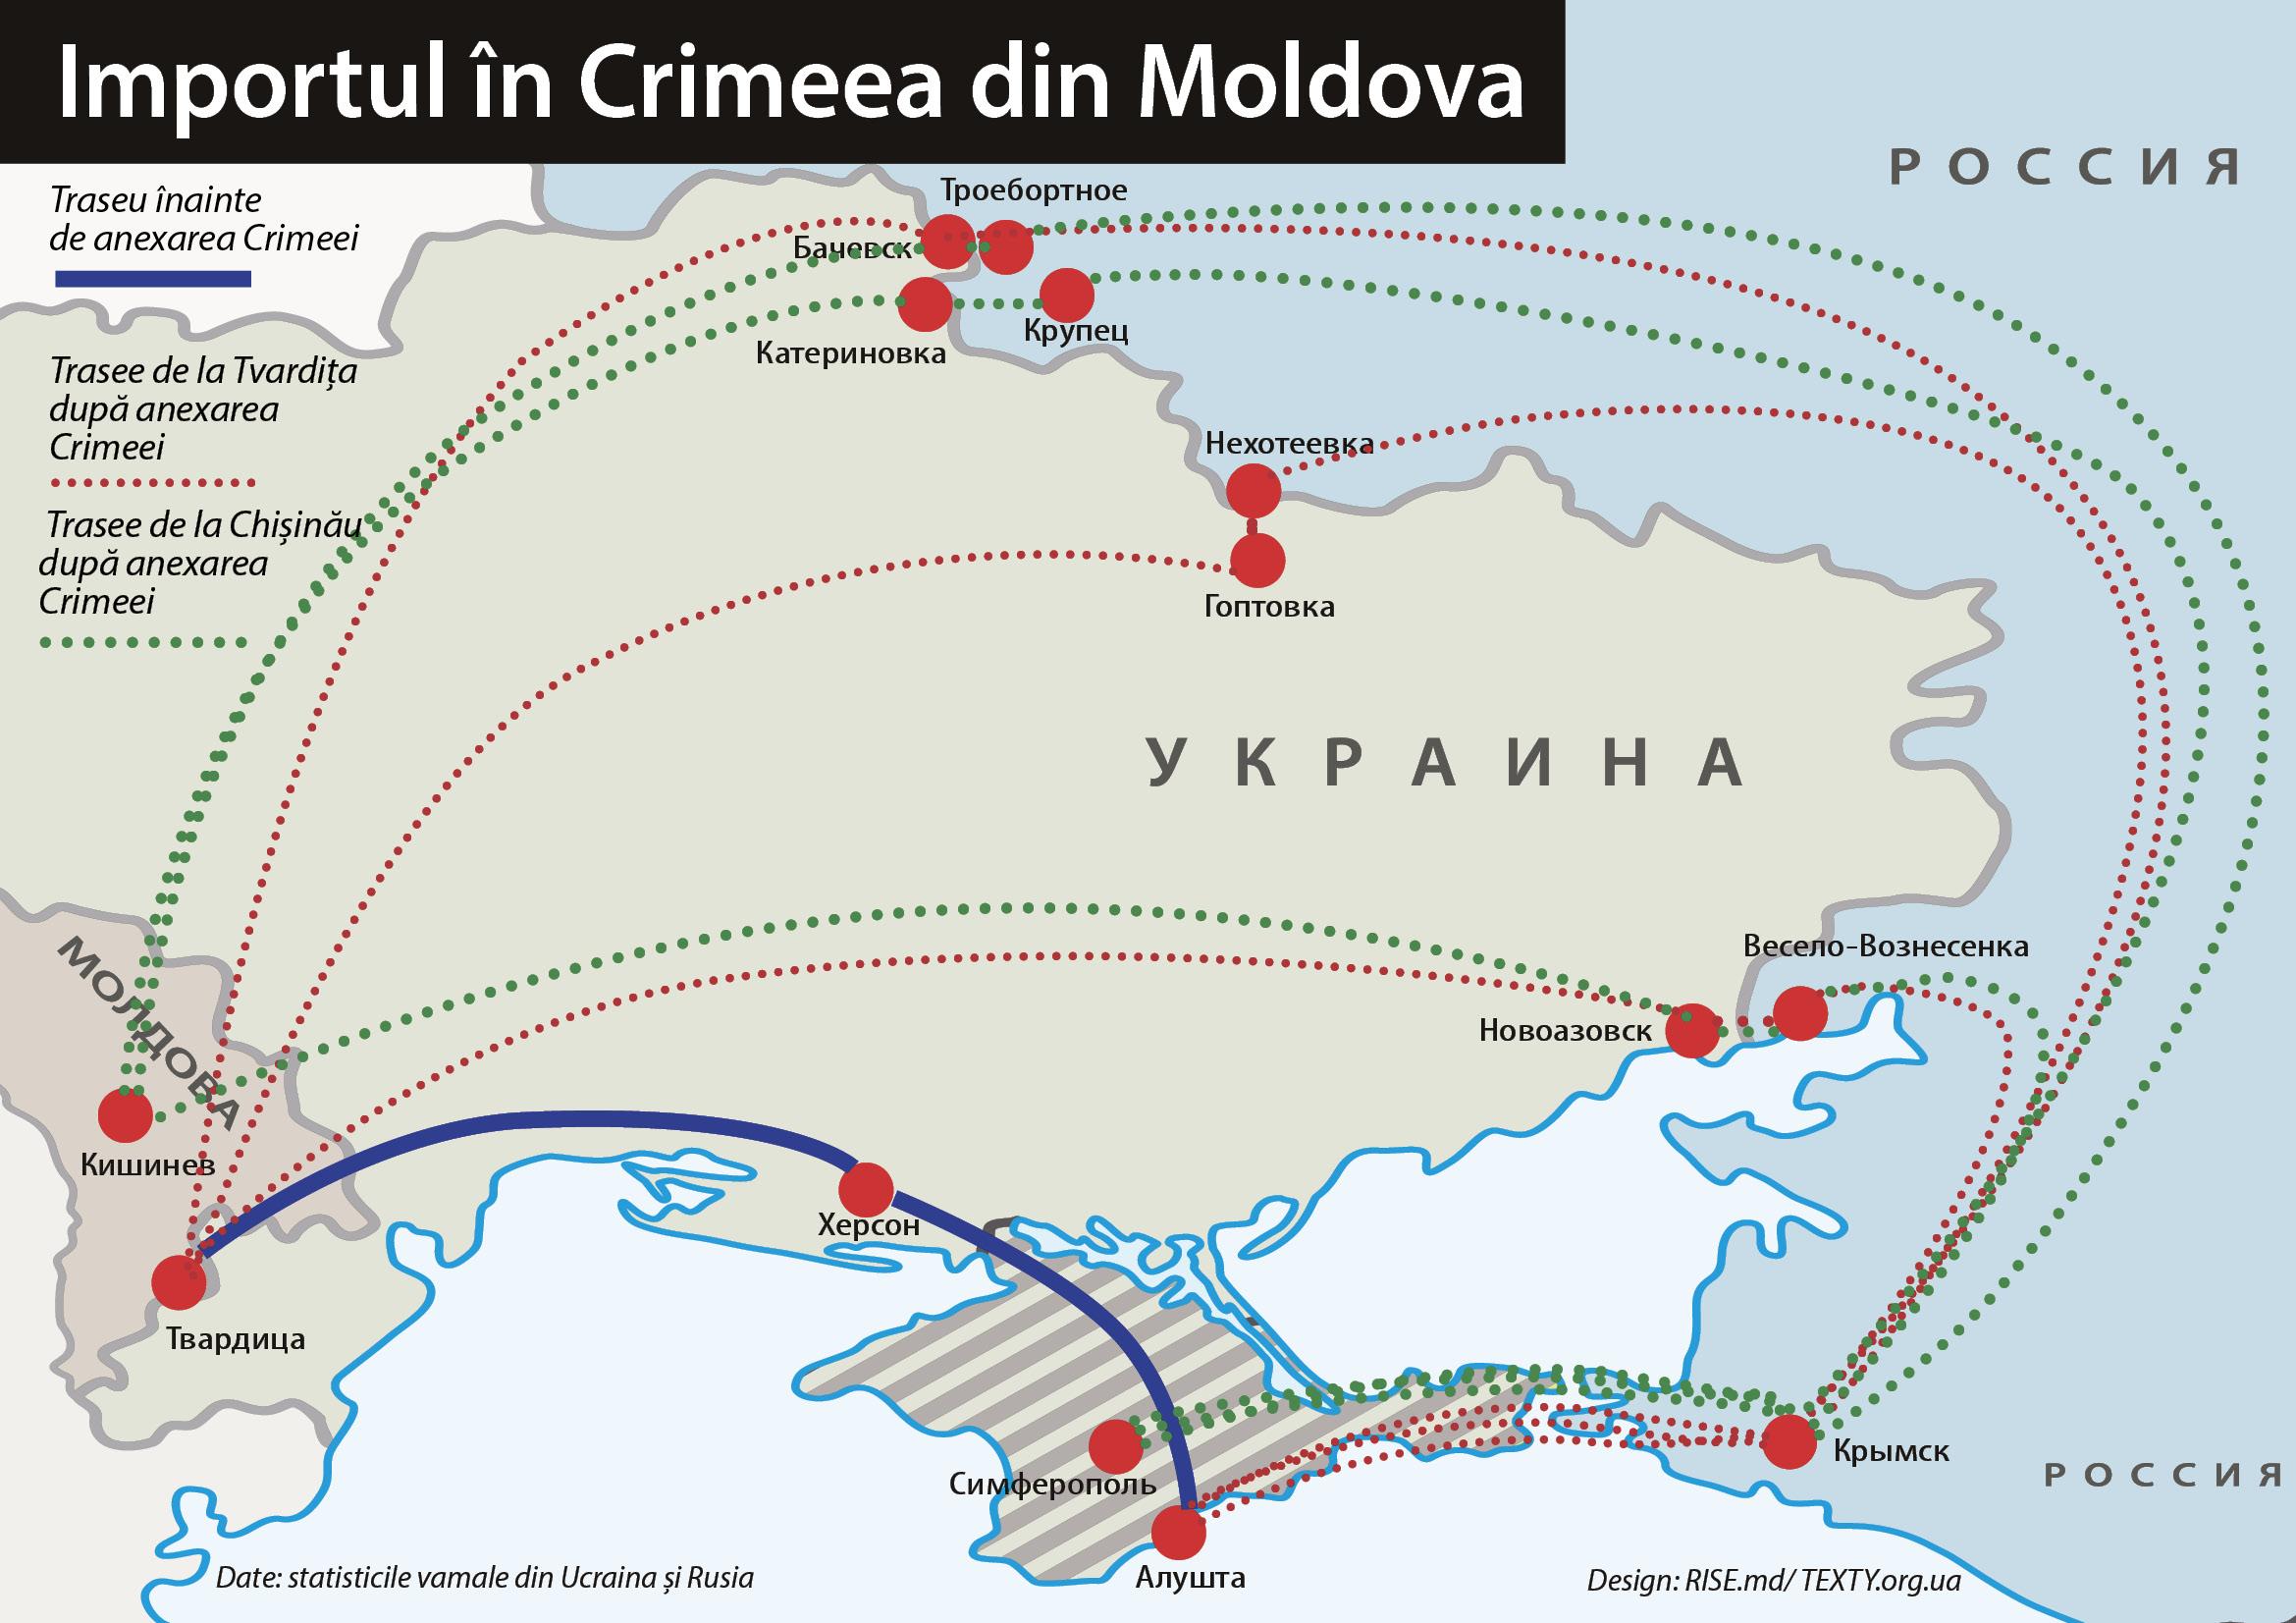 krimeea-ro-infografic